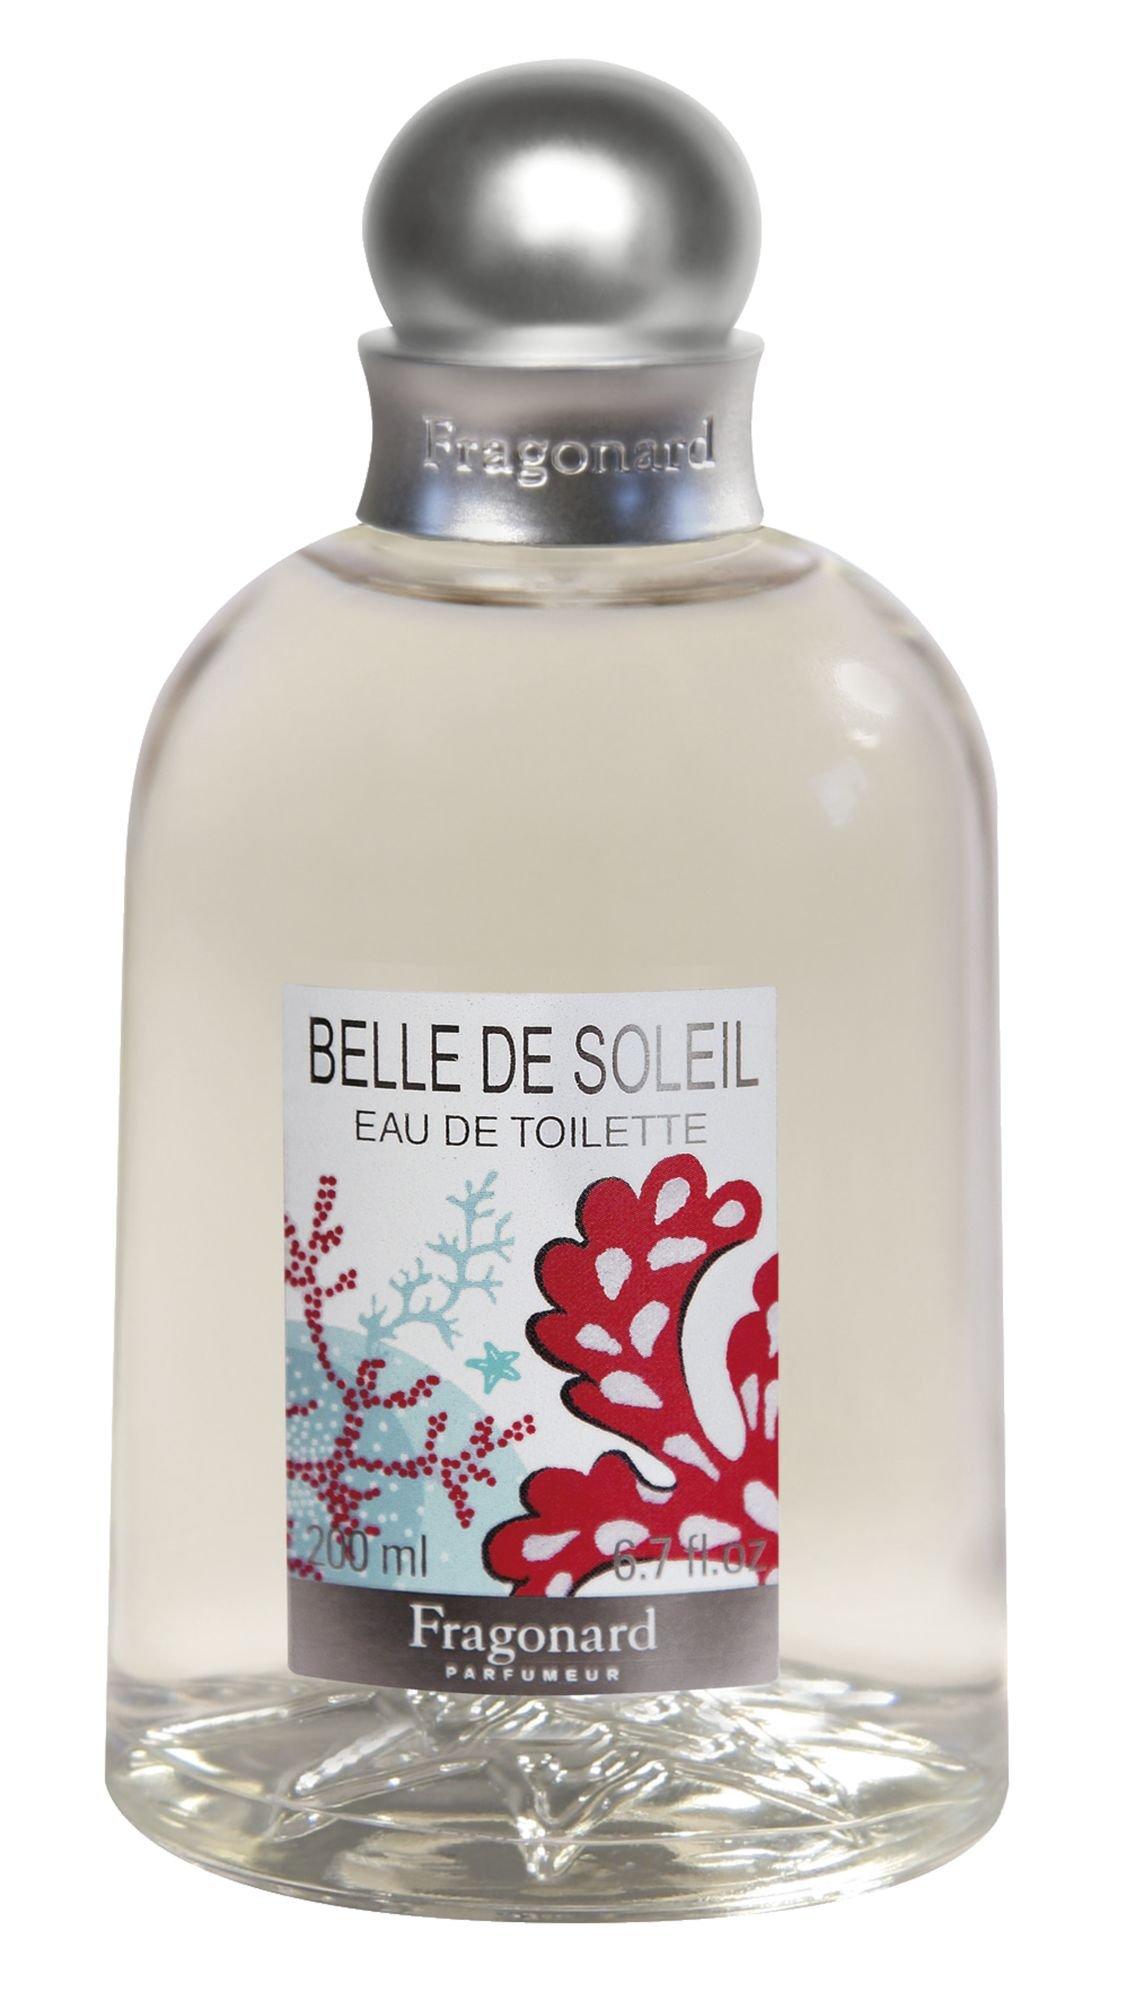 Belle de Soleil Fragonard للنساء